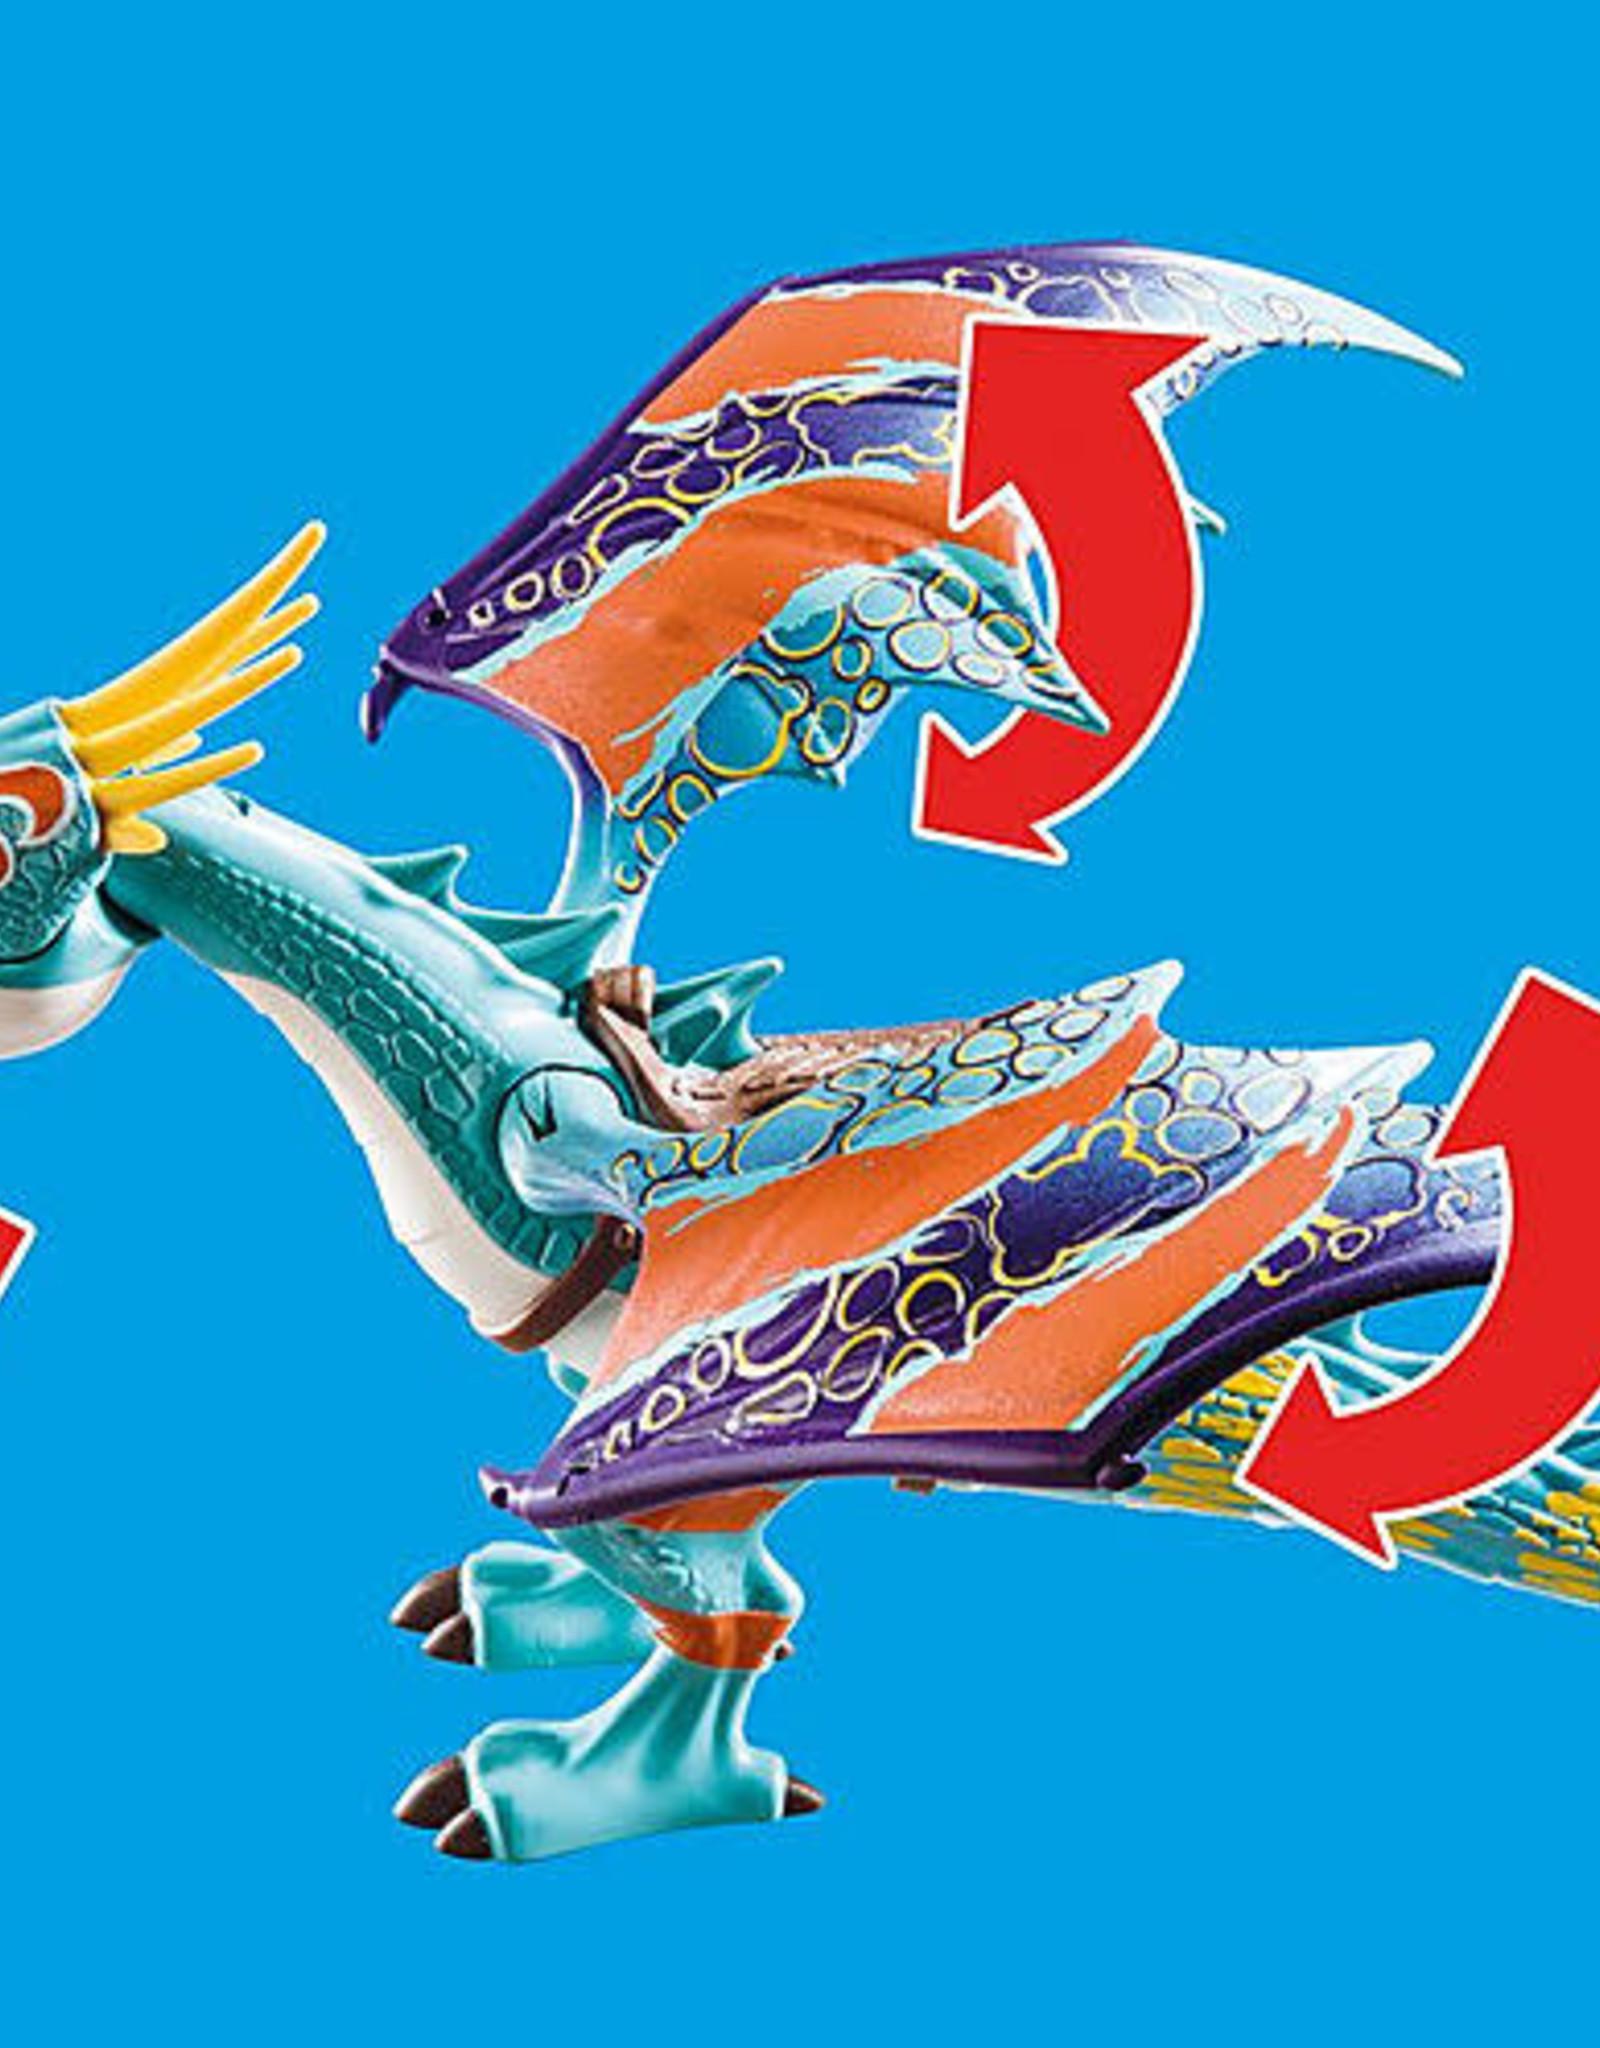 Playmobil PM Dragon Racing: Astrid and Stormfly